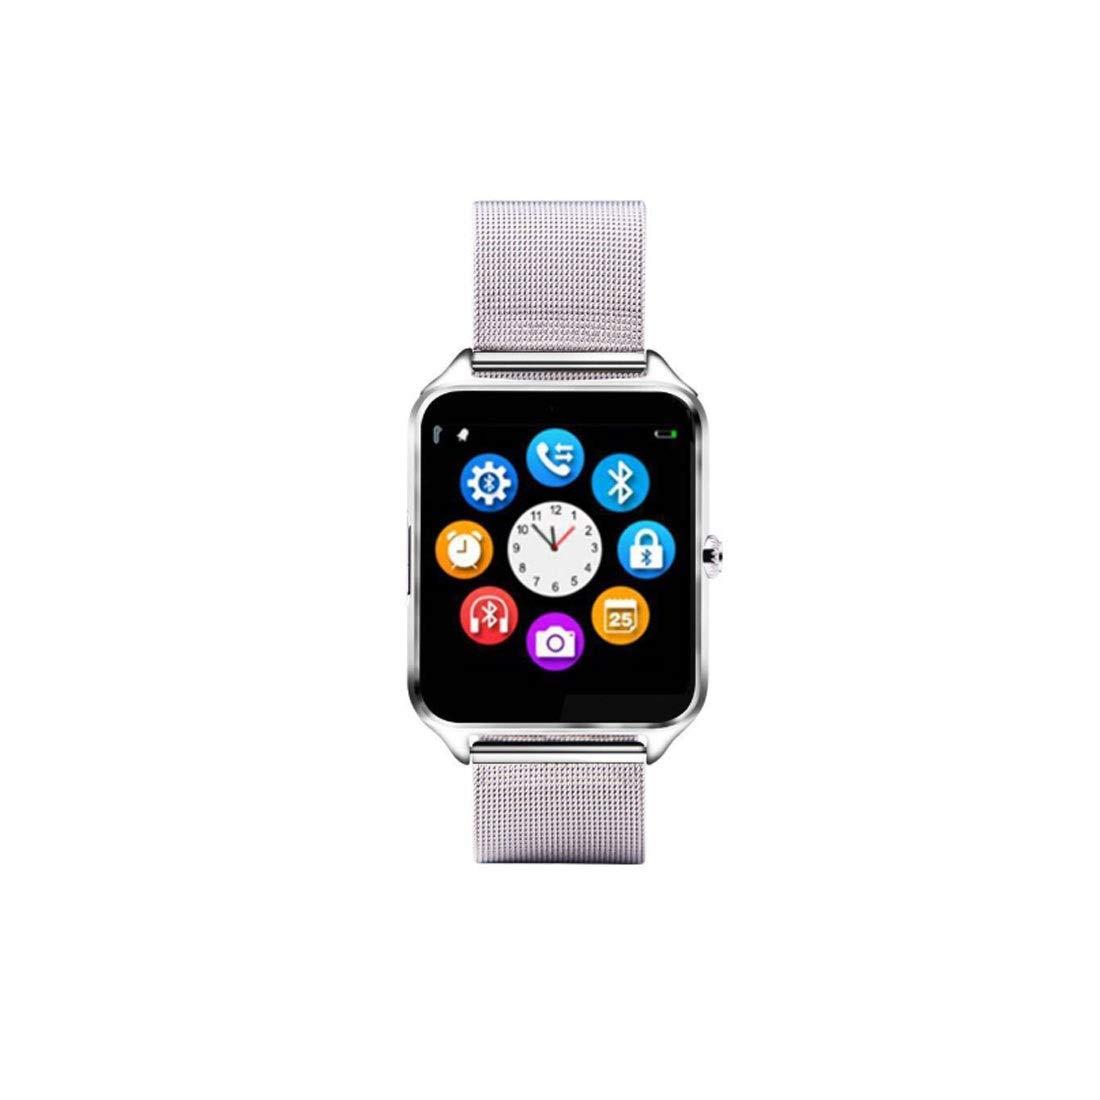 Hexiansheng Fitness Tracker Smart Watch Metal Steel with Card Call Phone Smart wear (Color : Silver)